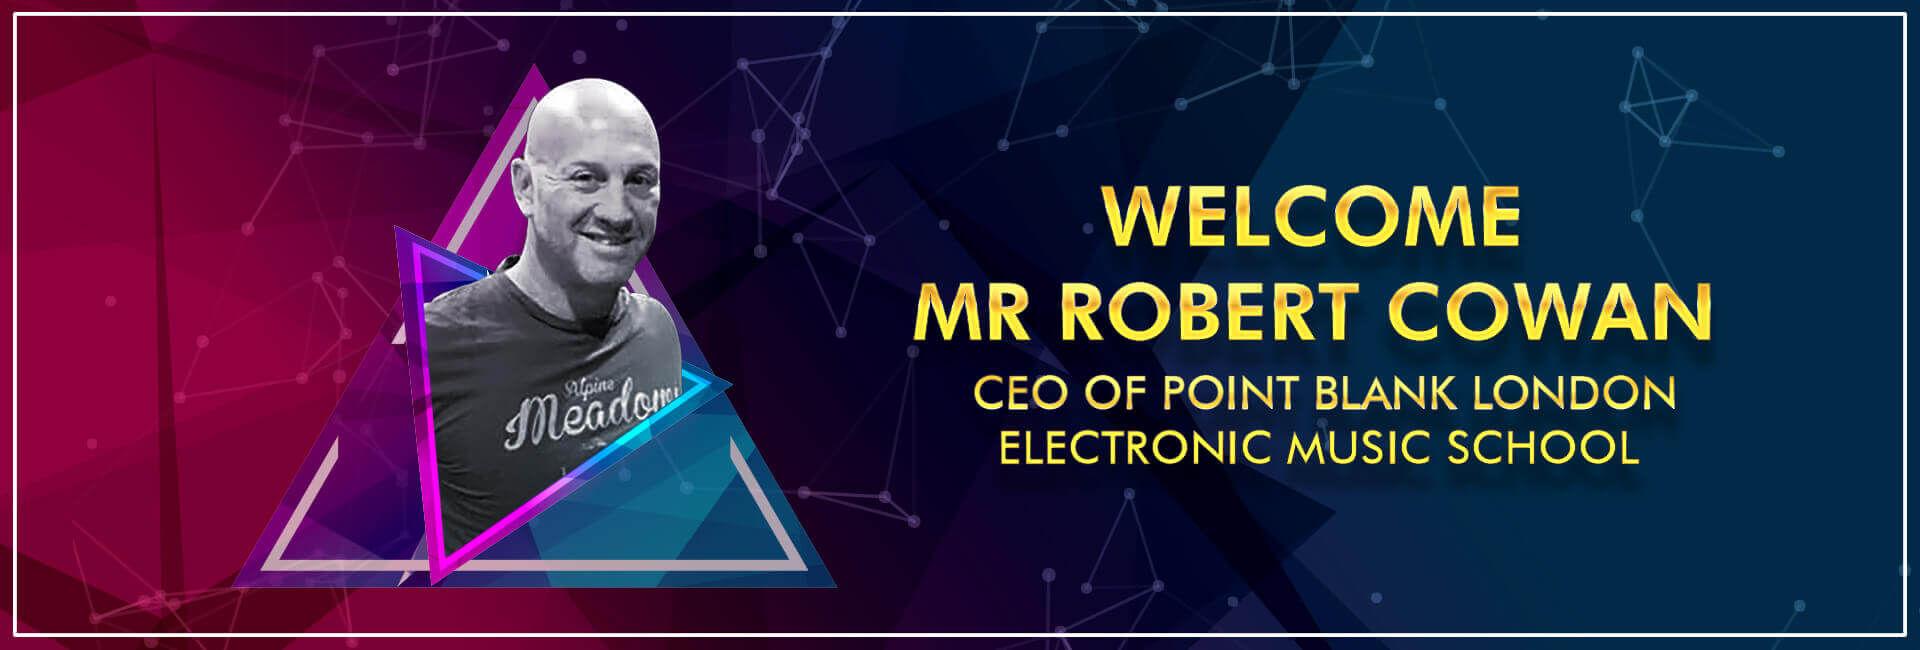 Robert Cowan, CEO of Point Blank, London